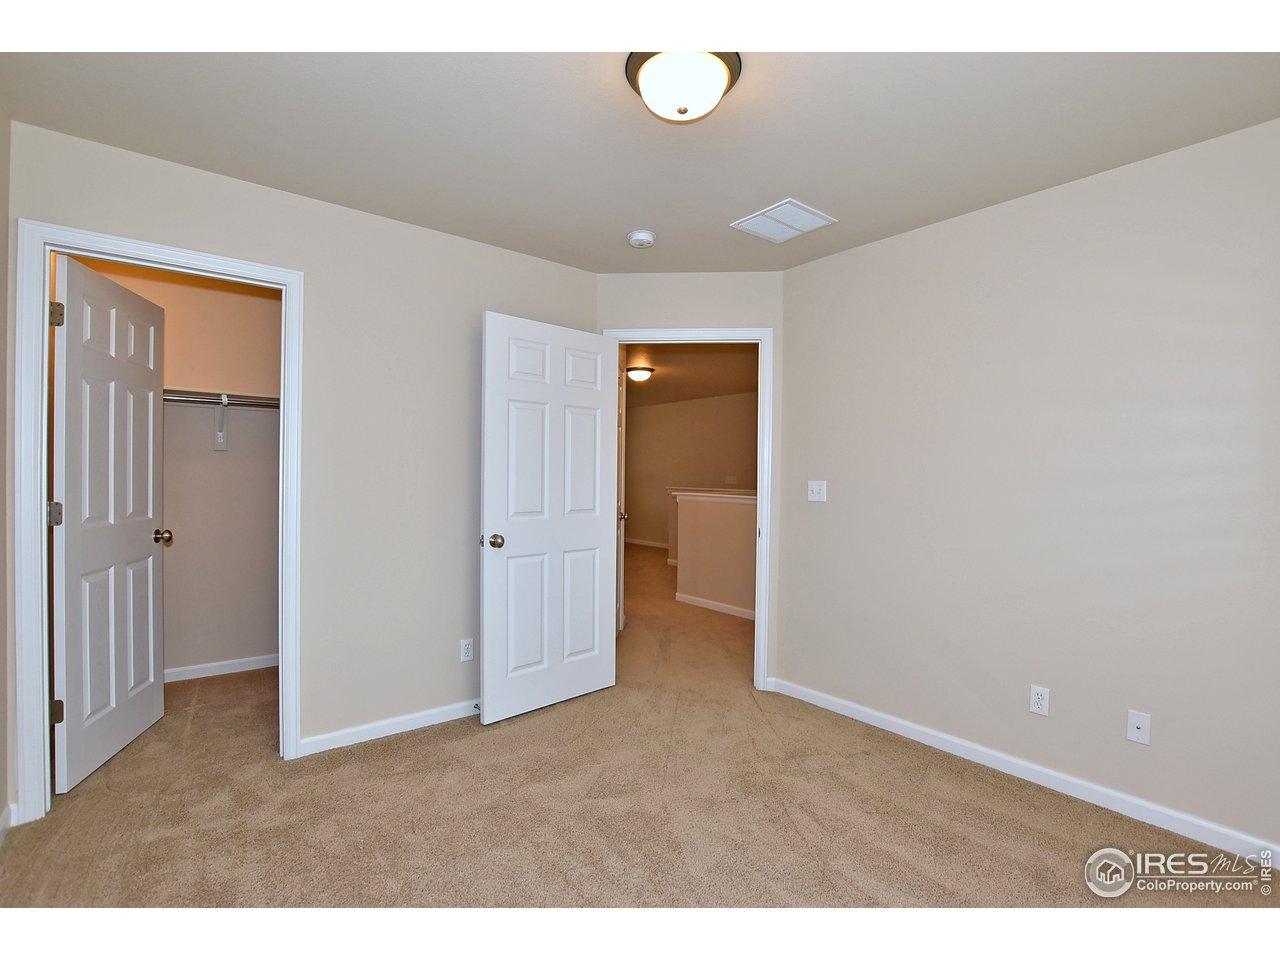 3rd upstairs bedroom w/ walk in closet